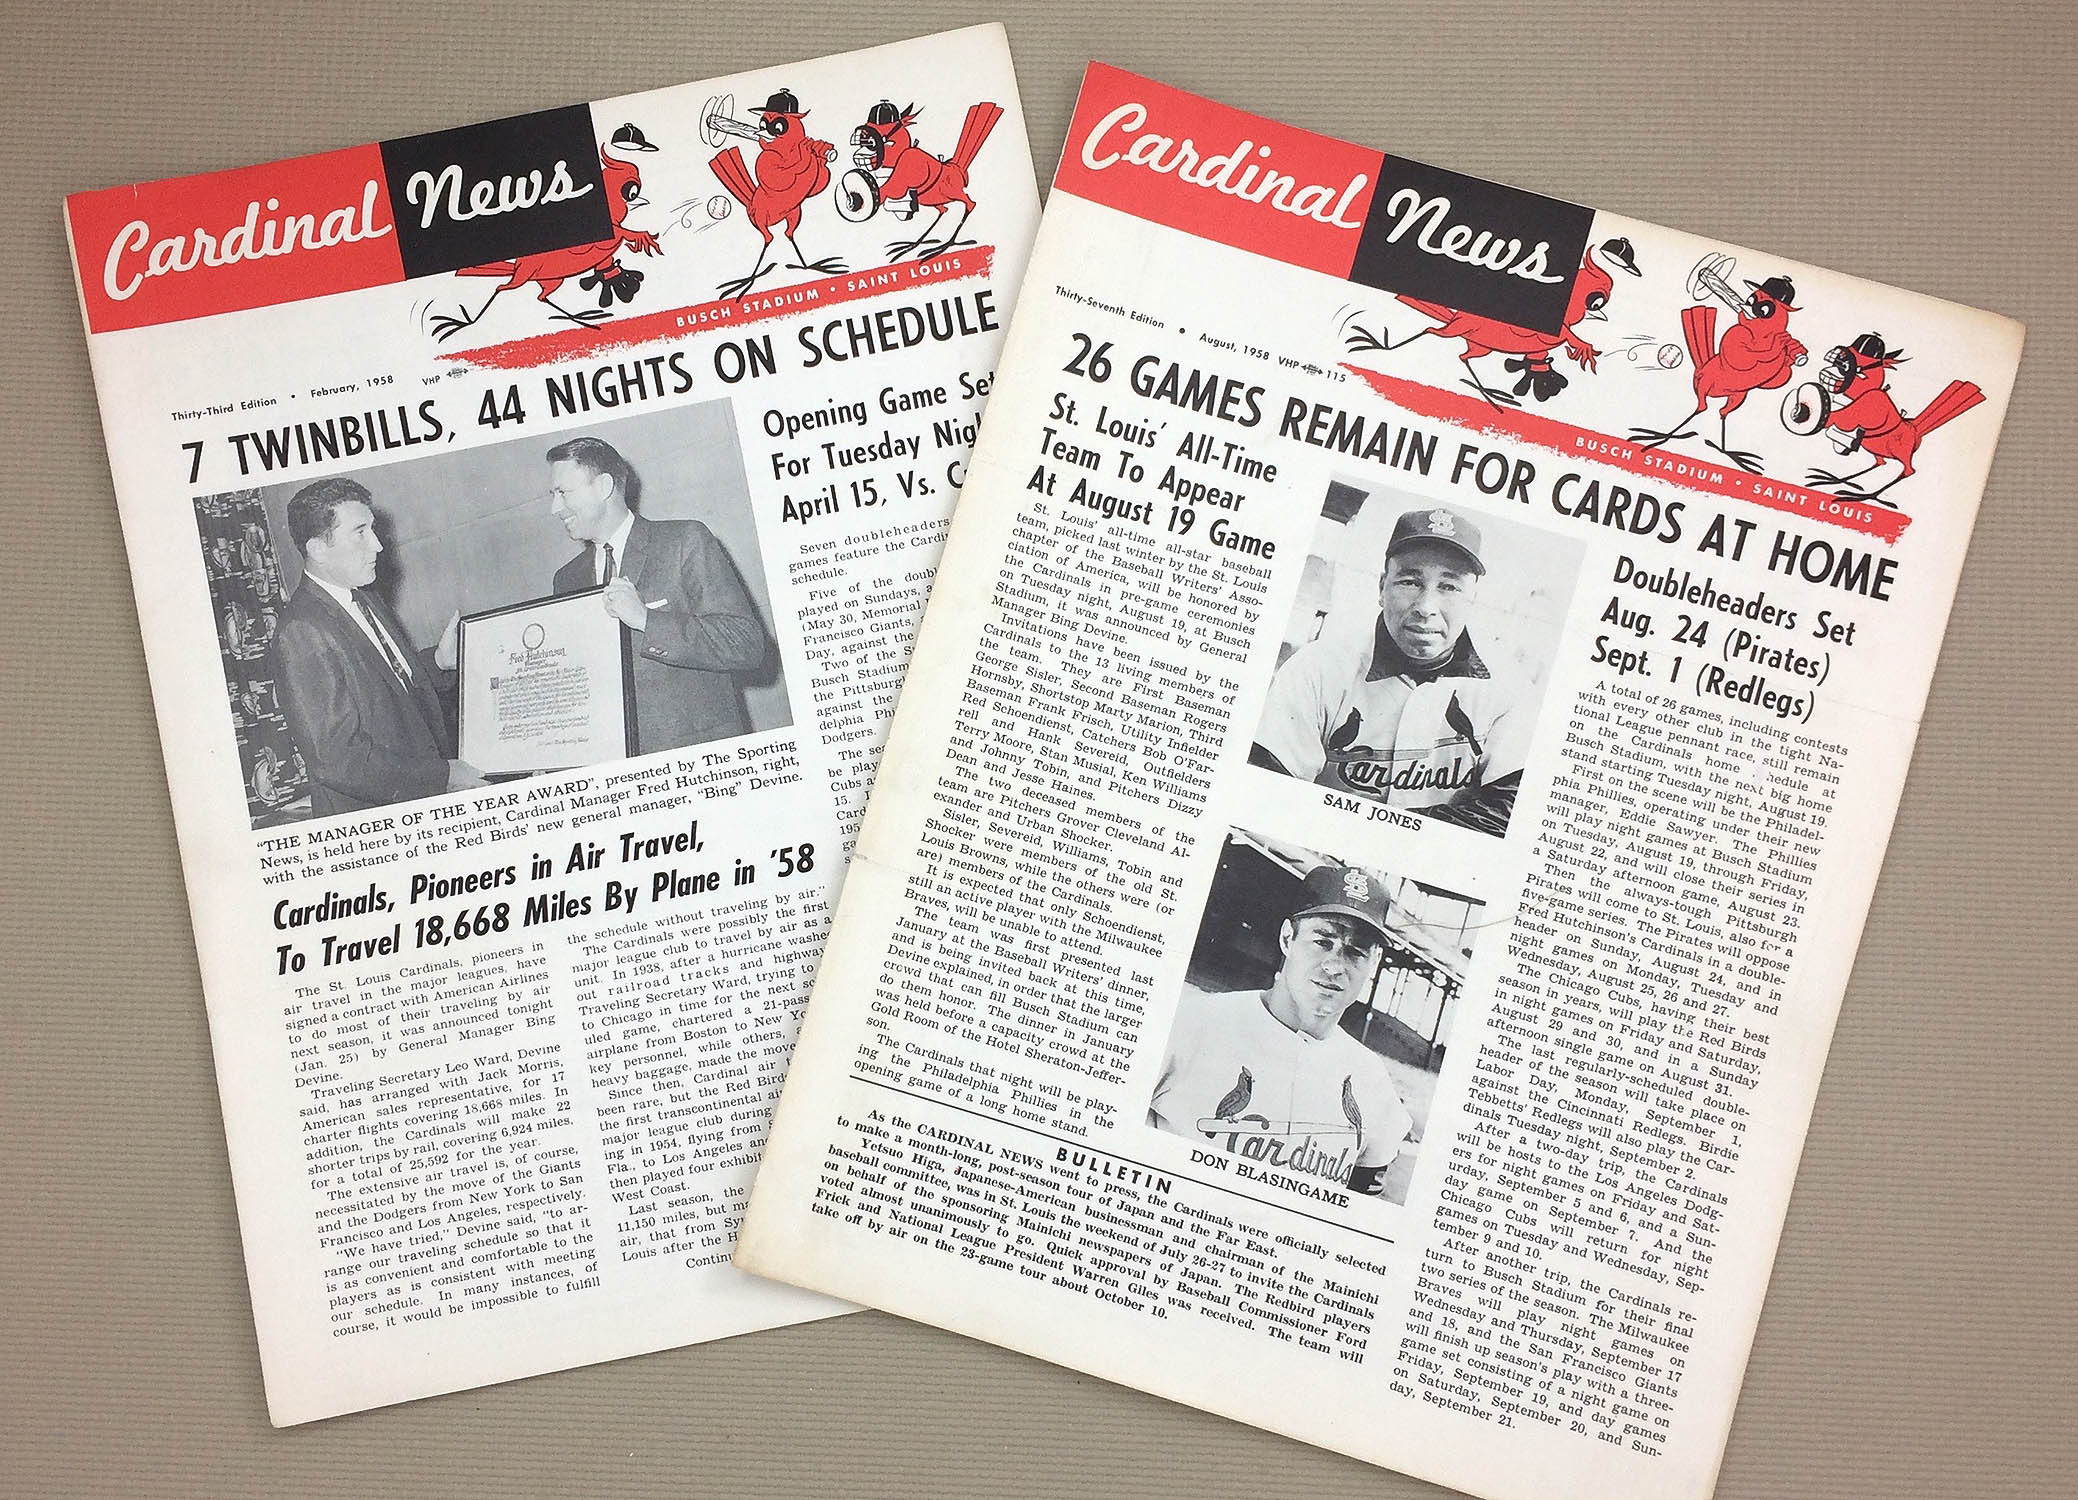 St Louis Cardinals Newsletters 1958